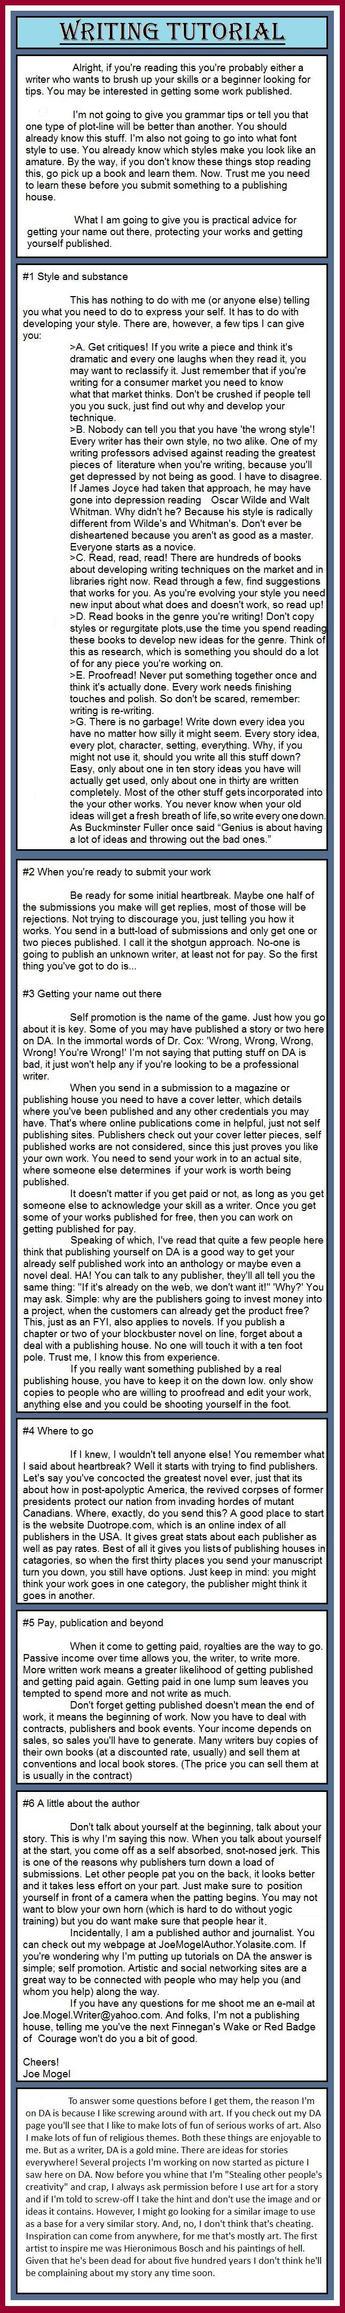 Writing Tutorial by jomog369